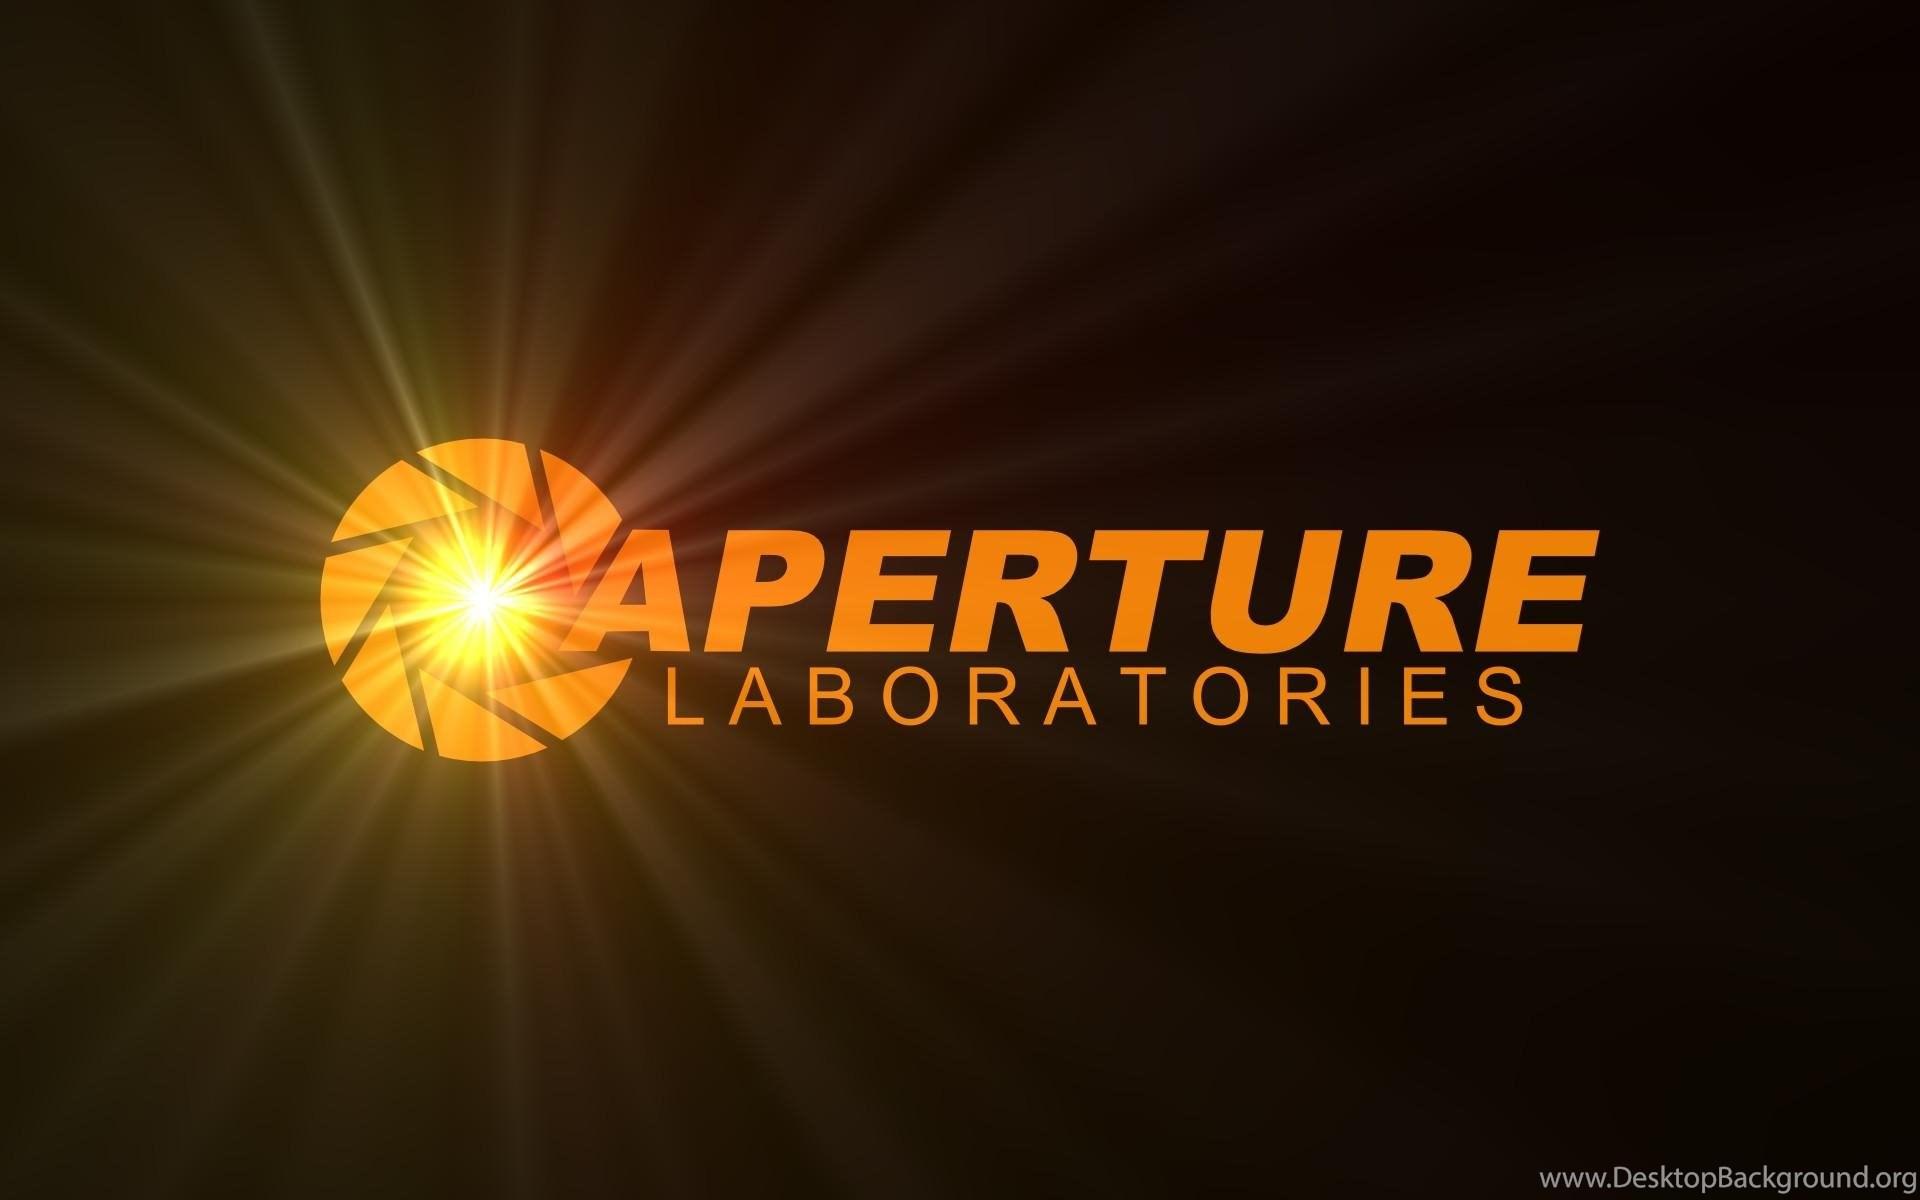 aperture science logo hd wallpapers fullhdwpp full hd desktop background